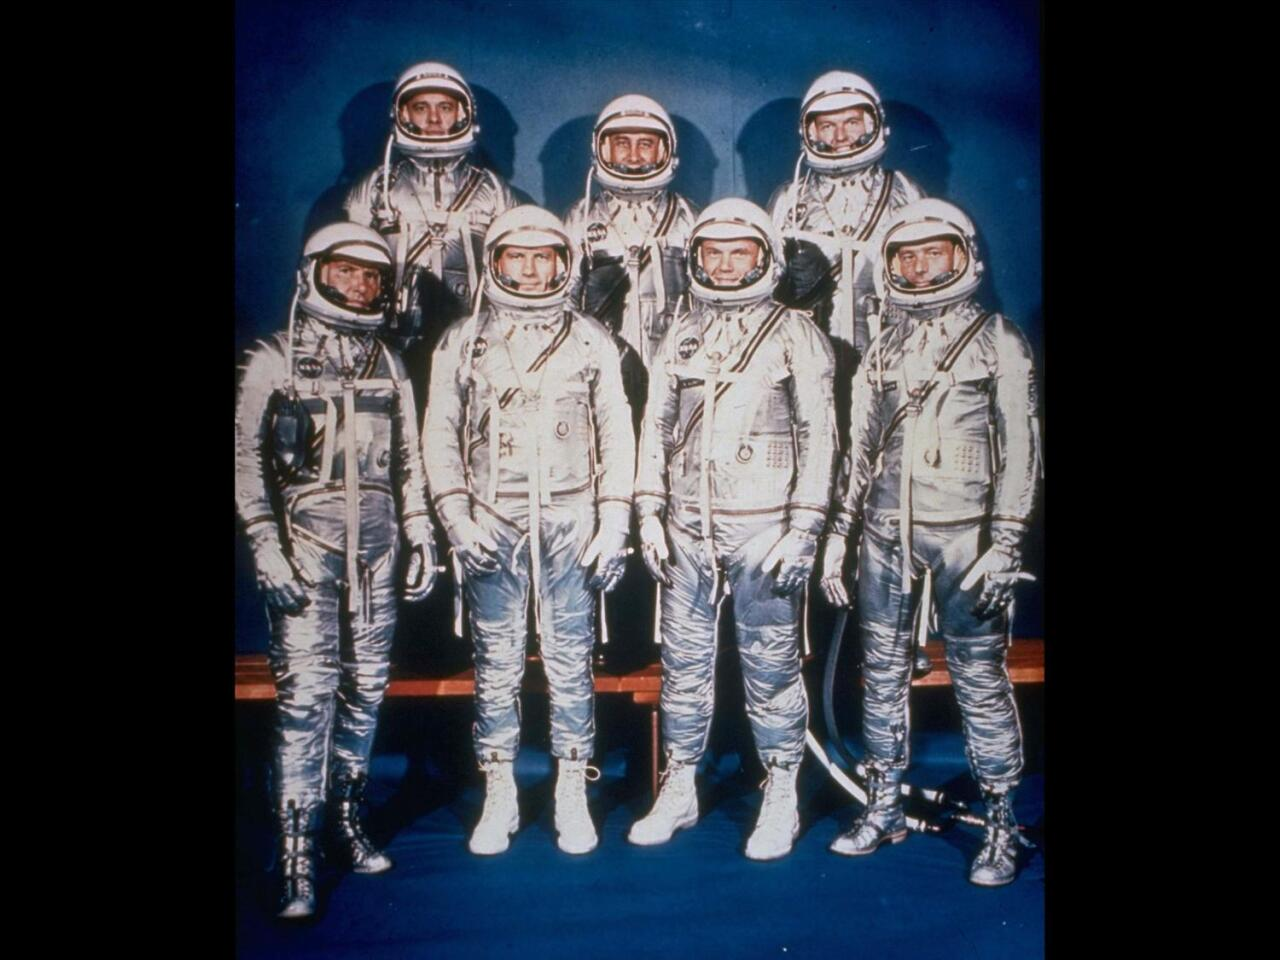 Mercury 7 astronauts: (l-r front) Walter Schirra, Donald Slayton, John Glenn, and Scott Carpenter; (back) Alan Shepard, Virgil Grissom, and Gordon Cooper, photo on black